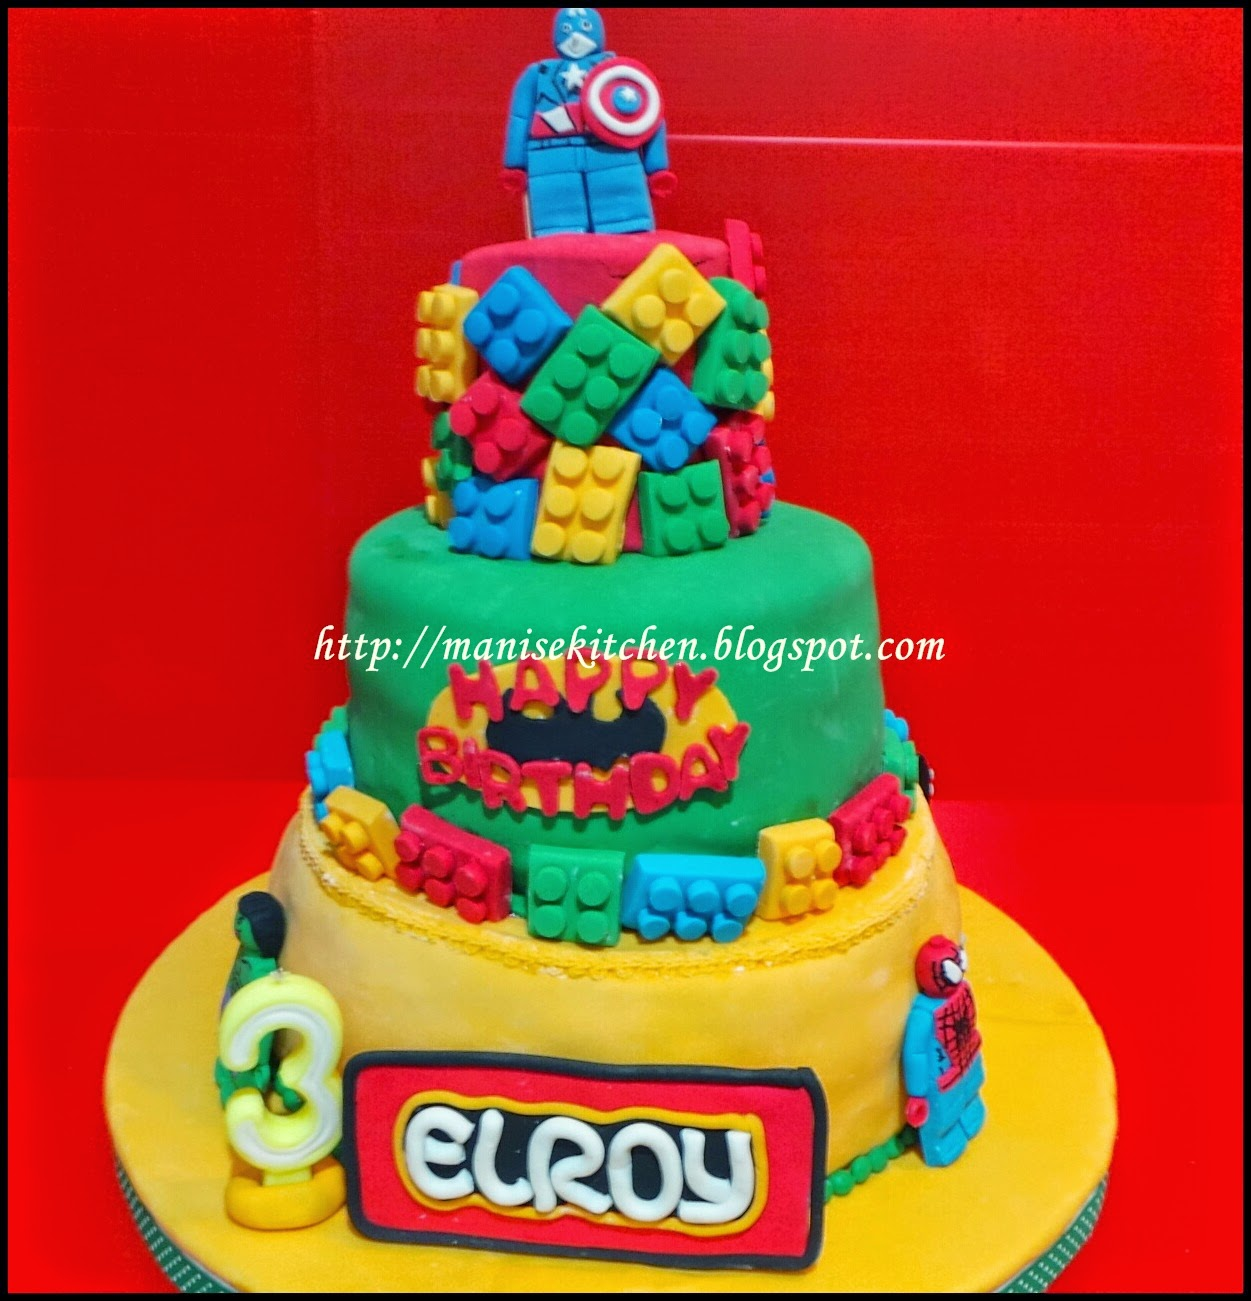 Manise Kitchen Lego Superhero Birthday Cake For Elroy Lopulisa